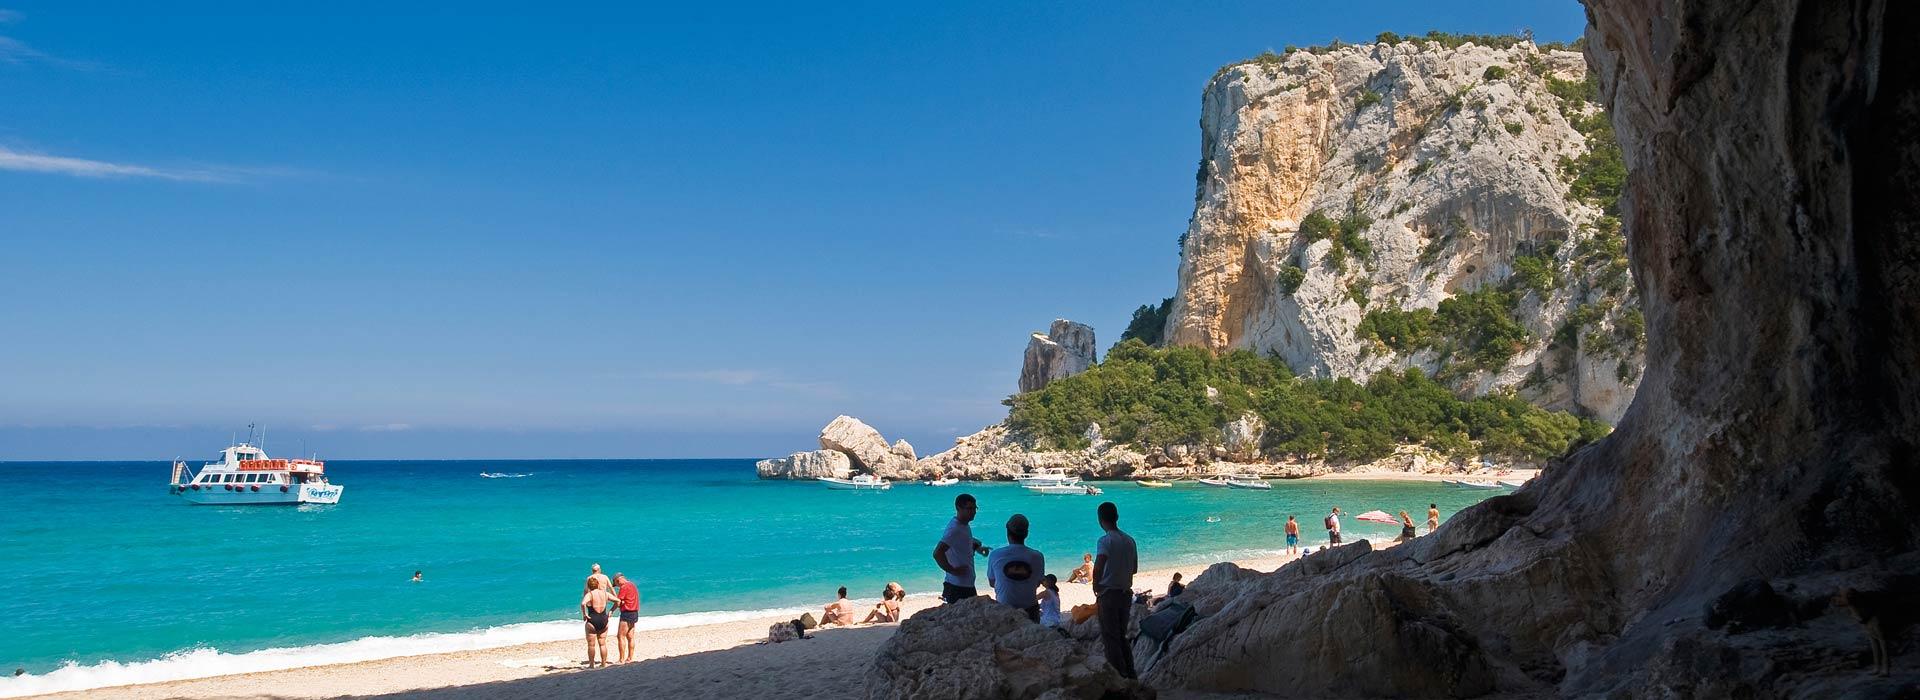 Spiagge Sardegna - Cala Luna